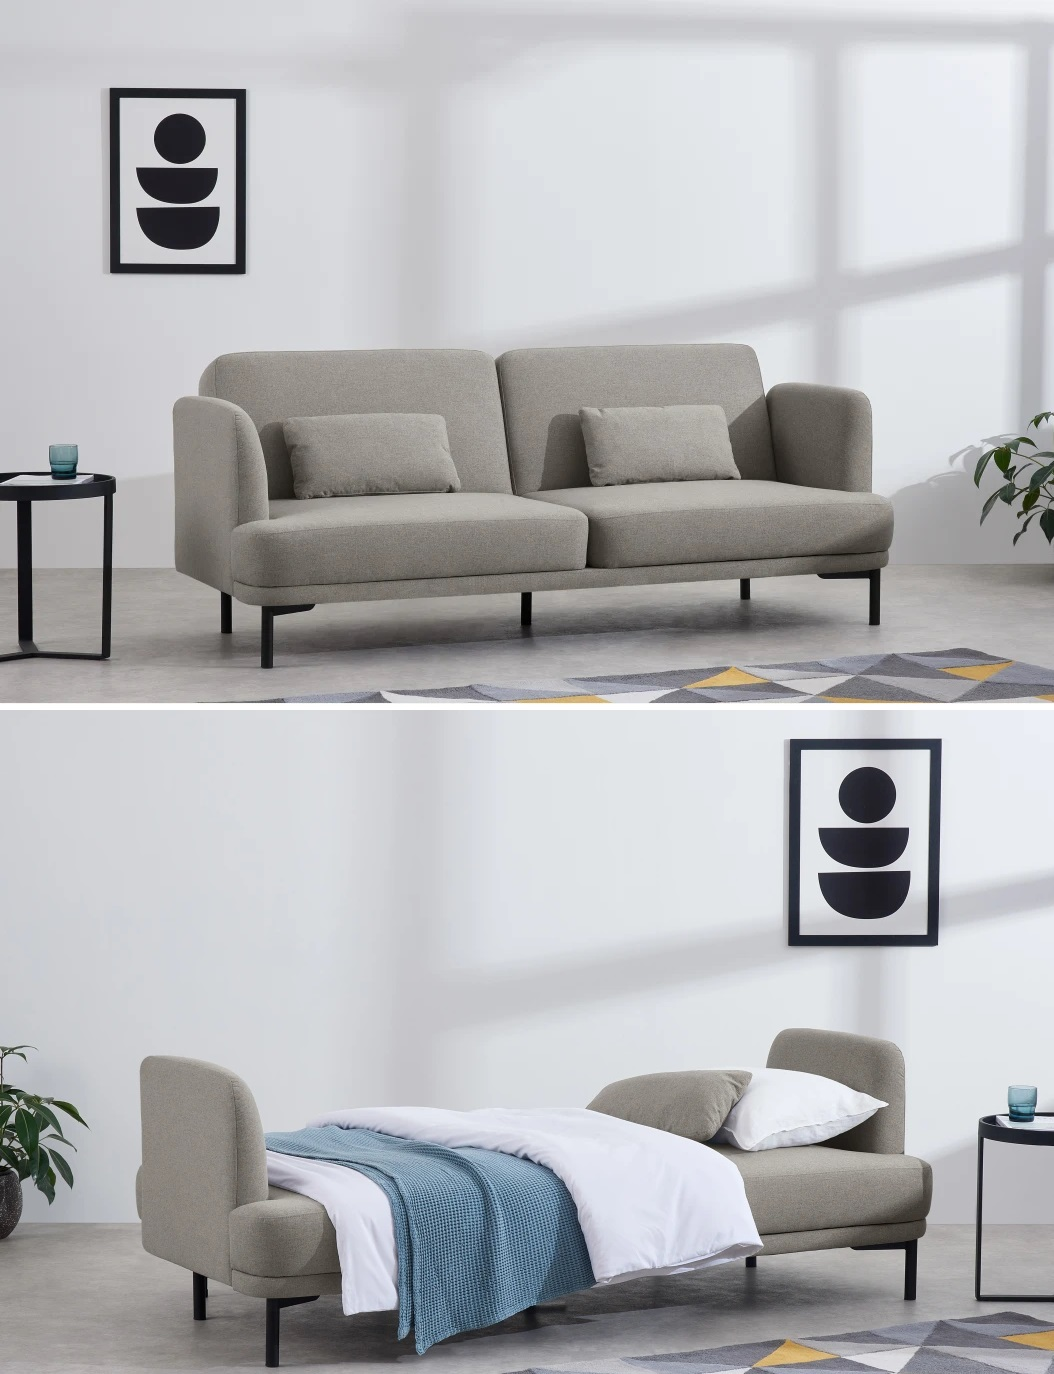 Sofá cama desmontable